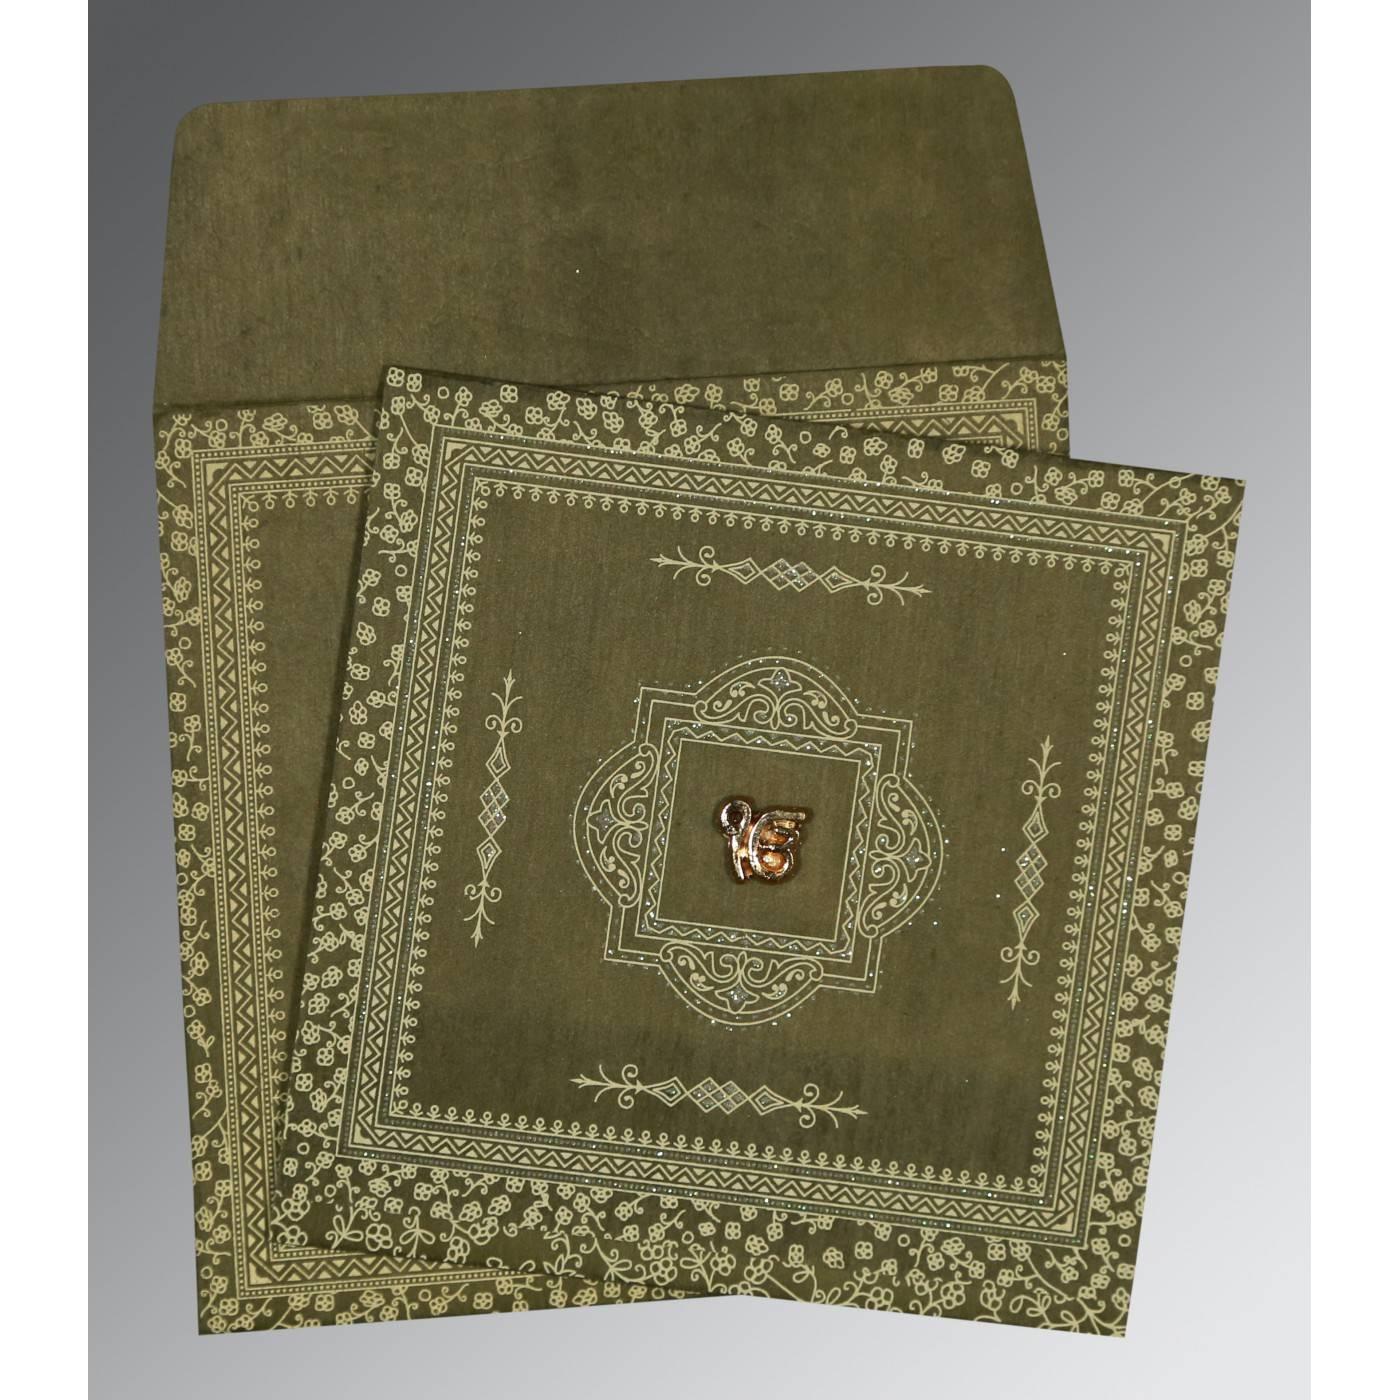 DEEP SAGE WOOLY GLITTER WEDDING CARD : CS-8205G - IndianWeddingCards